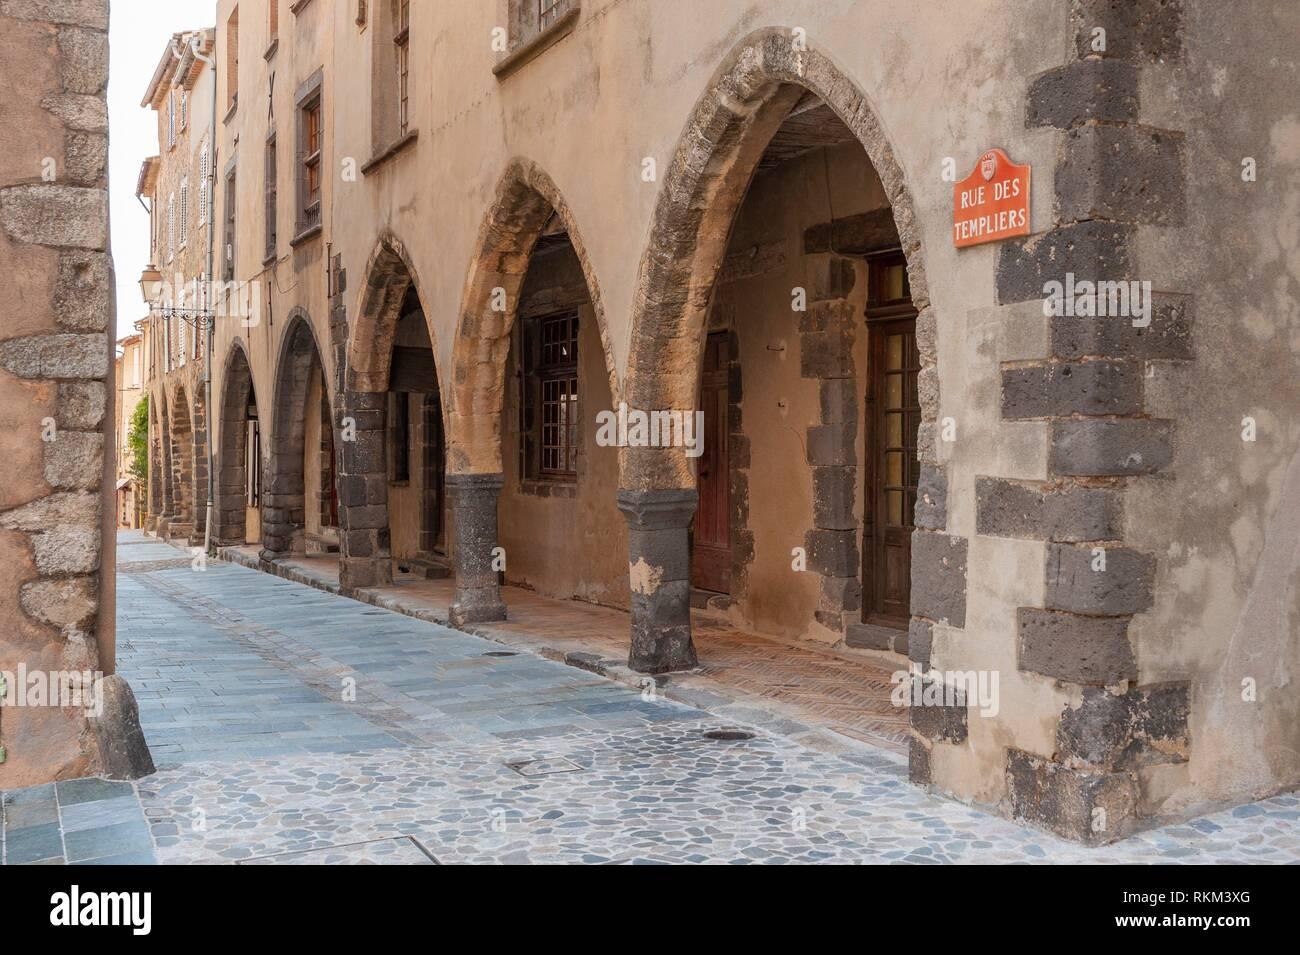 Arcades in the historic Rue des Templiers, Grimaud-Village, Var, Provence-Alpes-Cote d`Azur, France, Europe. - Stock Image